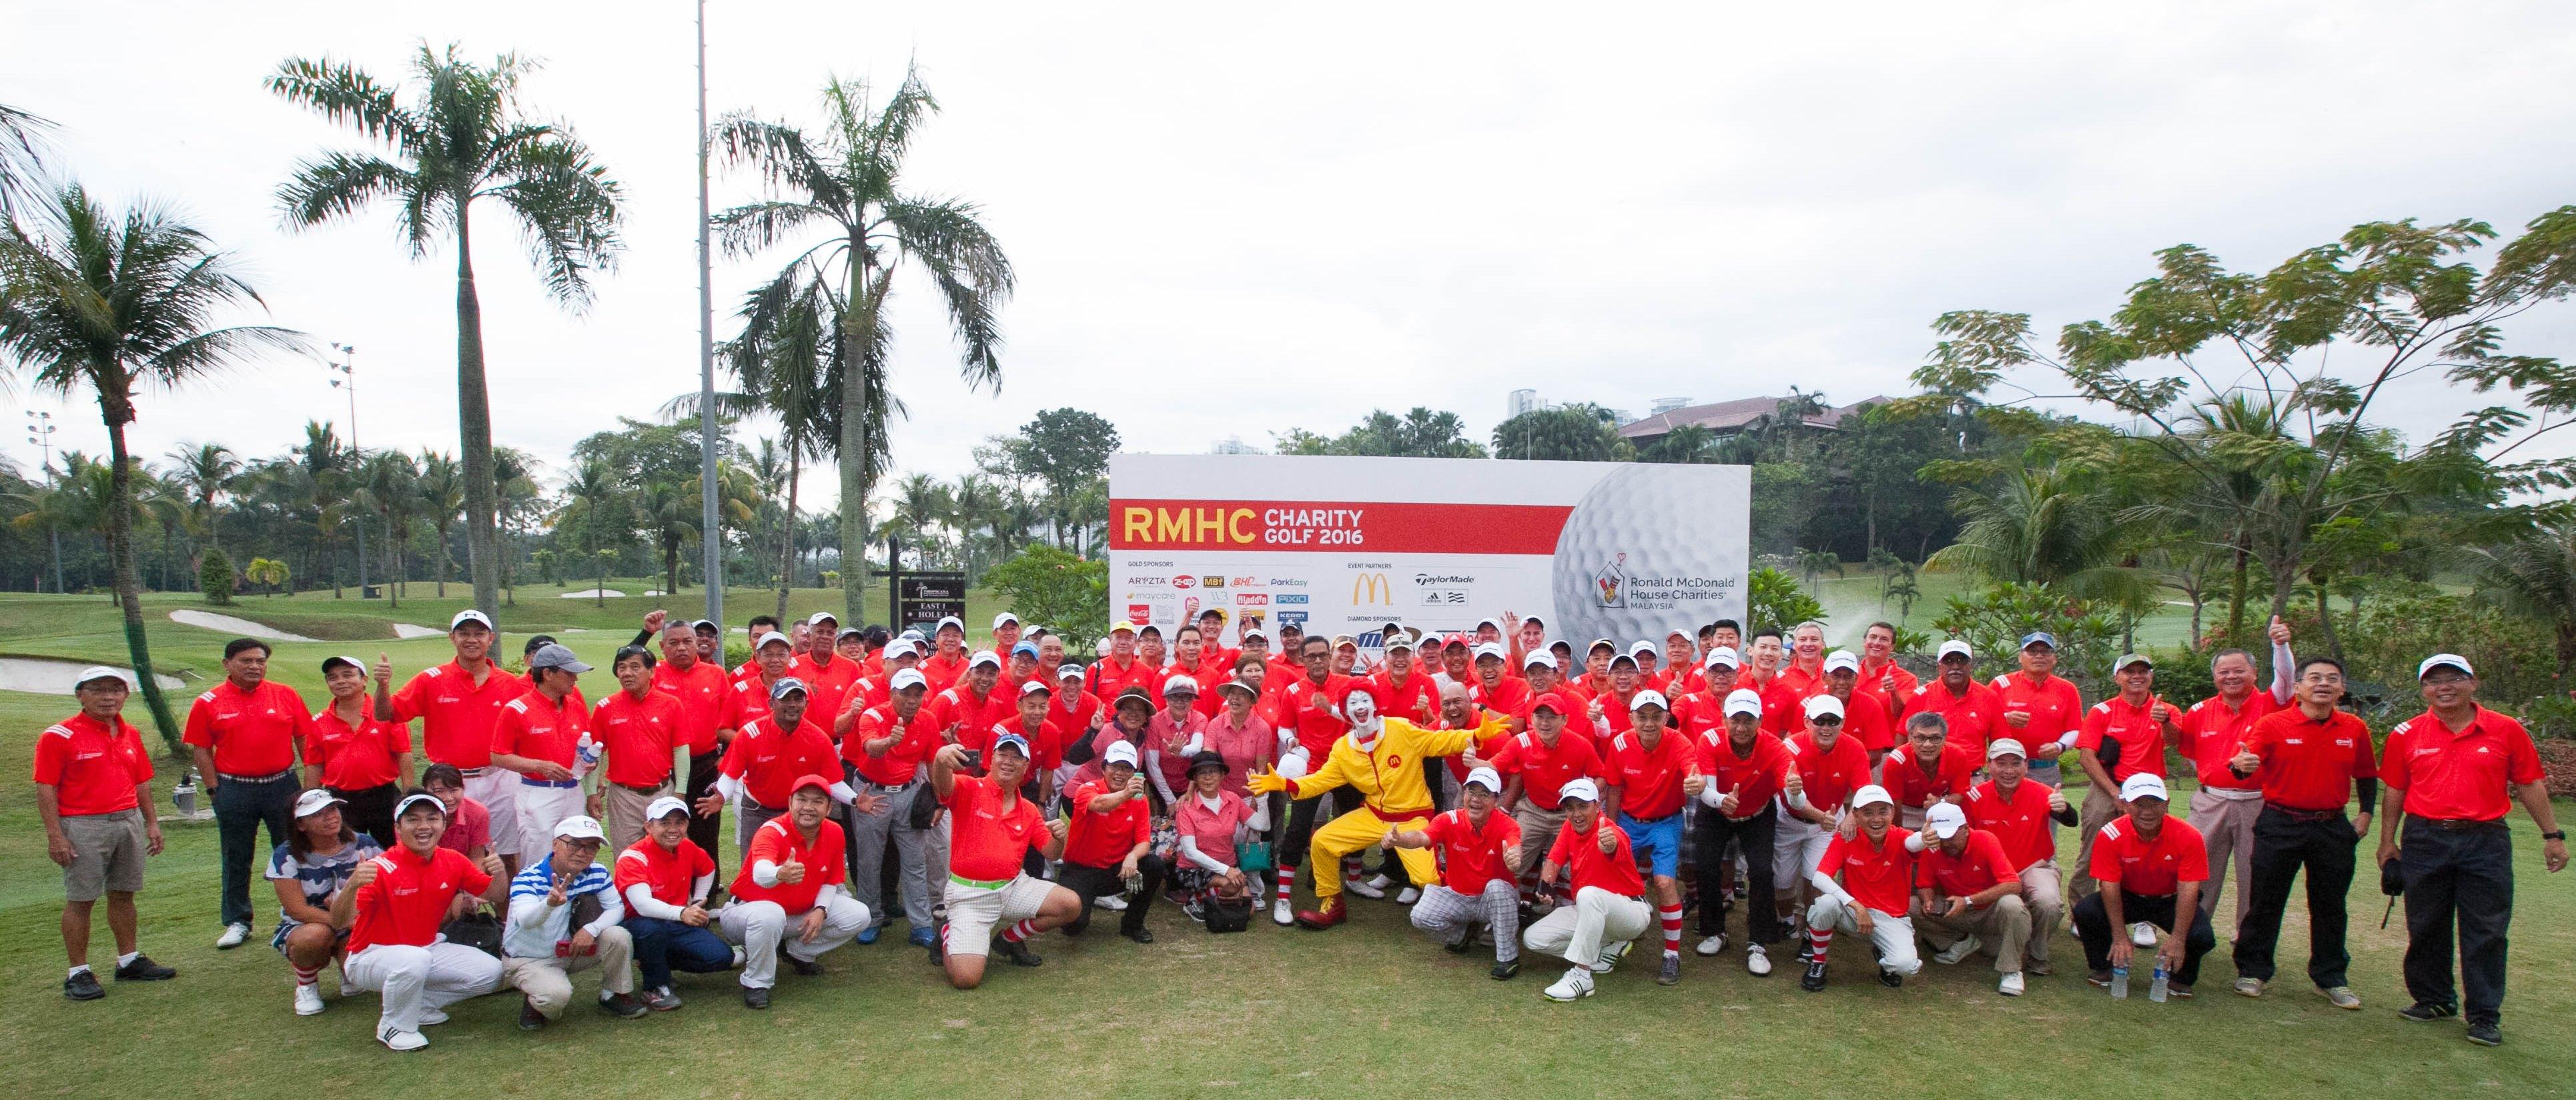 Main Pic - Golf Group